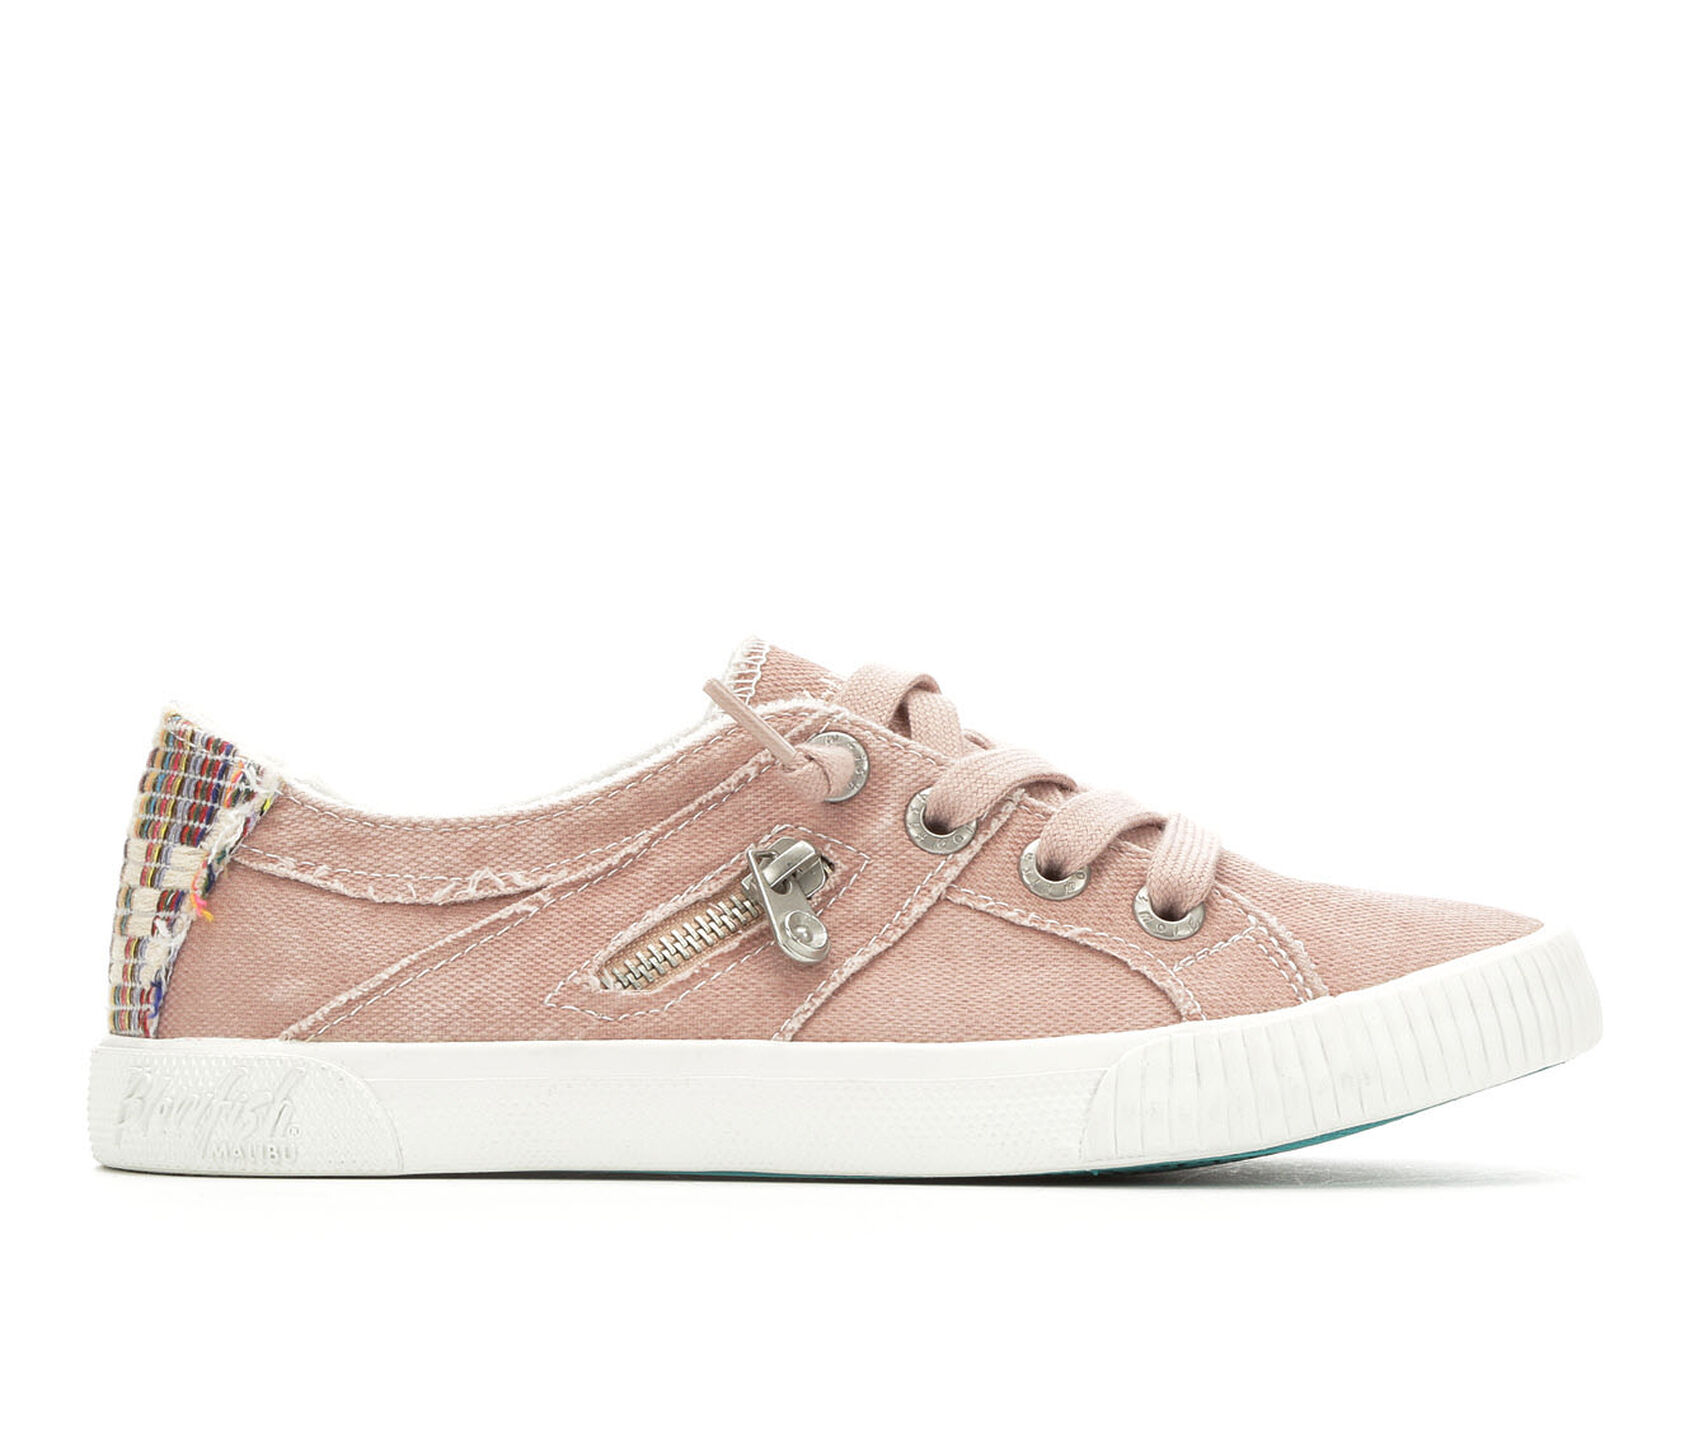 beacbc6d5d1 Women s Blowfish Malibu Fruit Sneakers